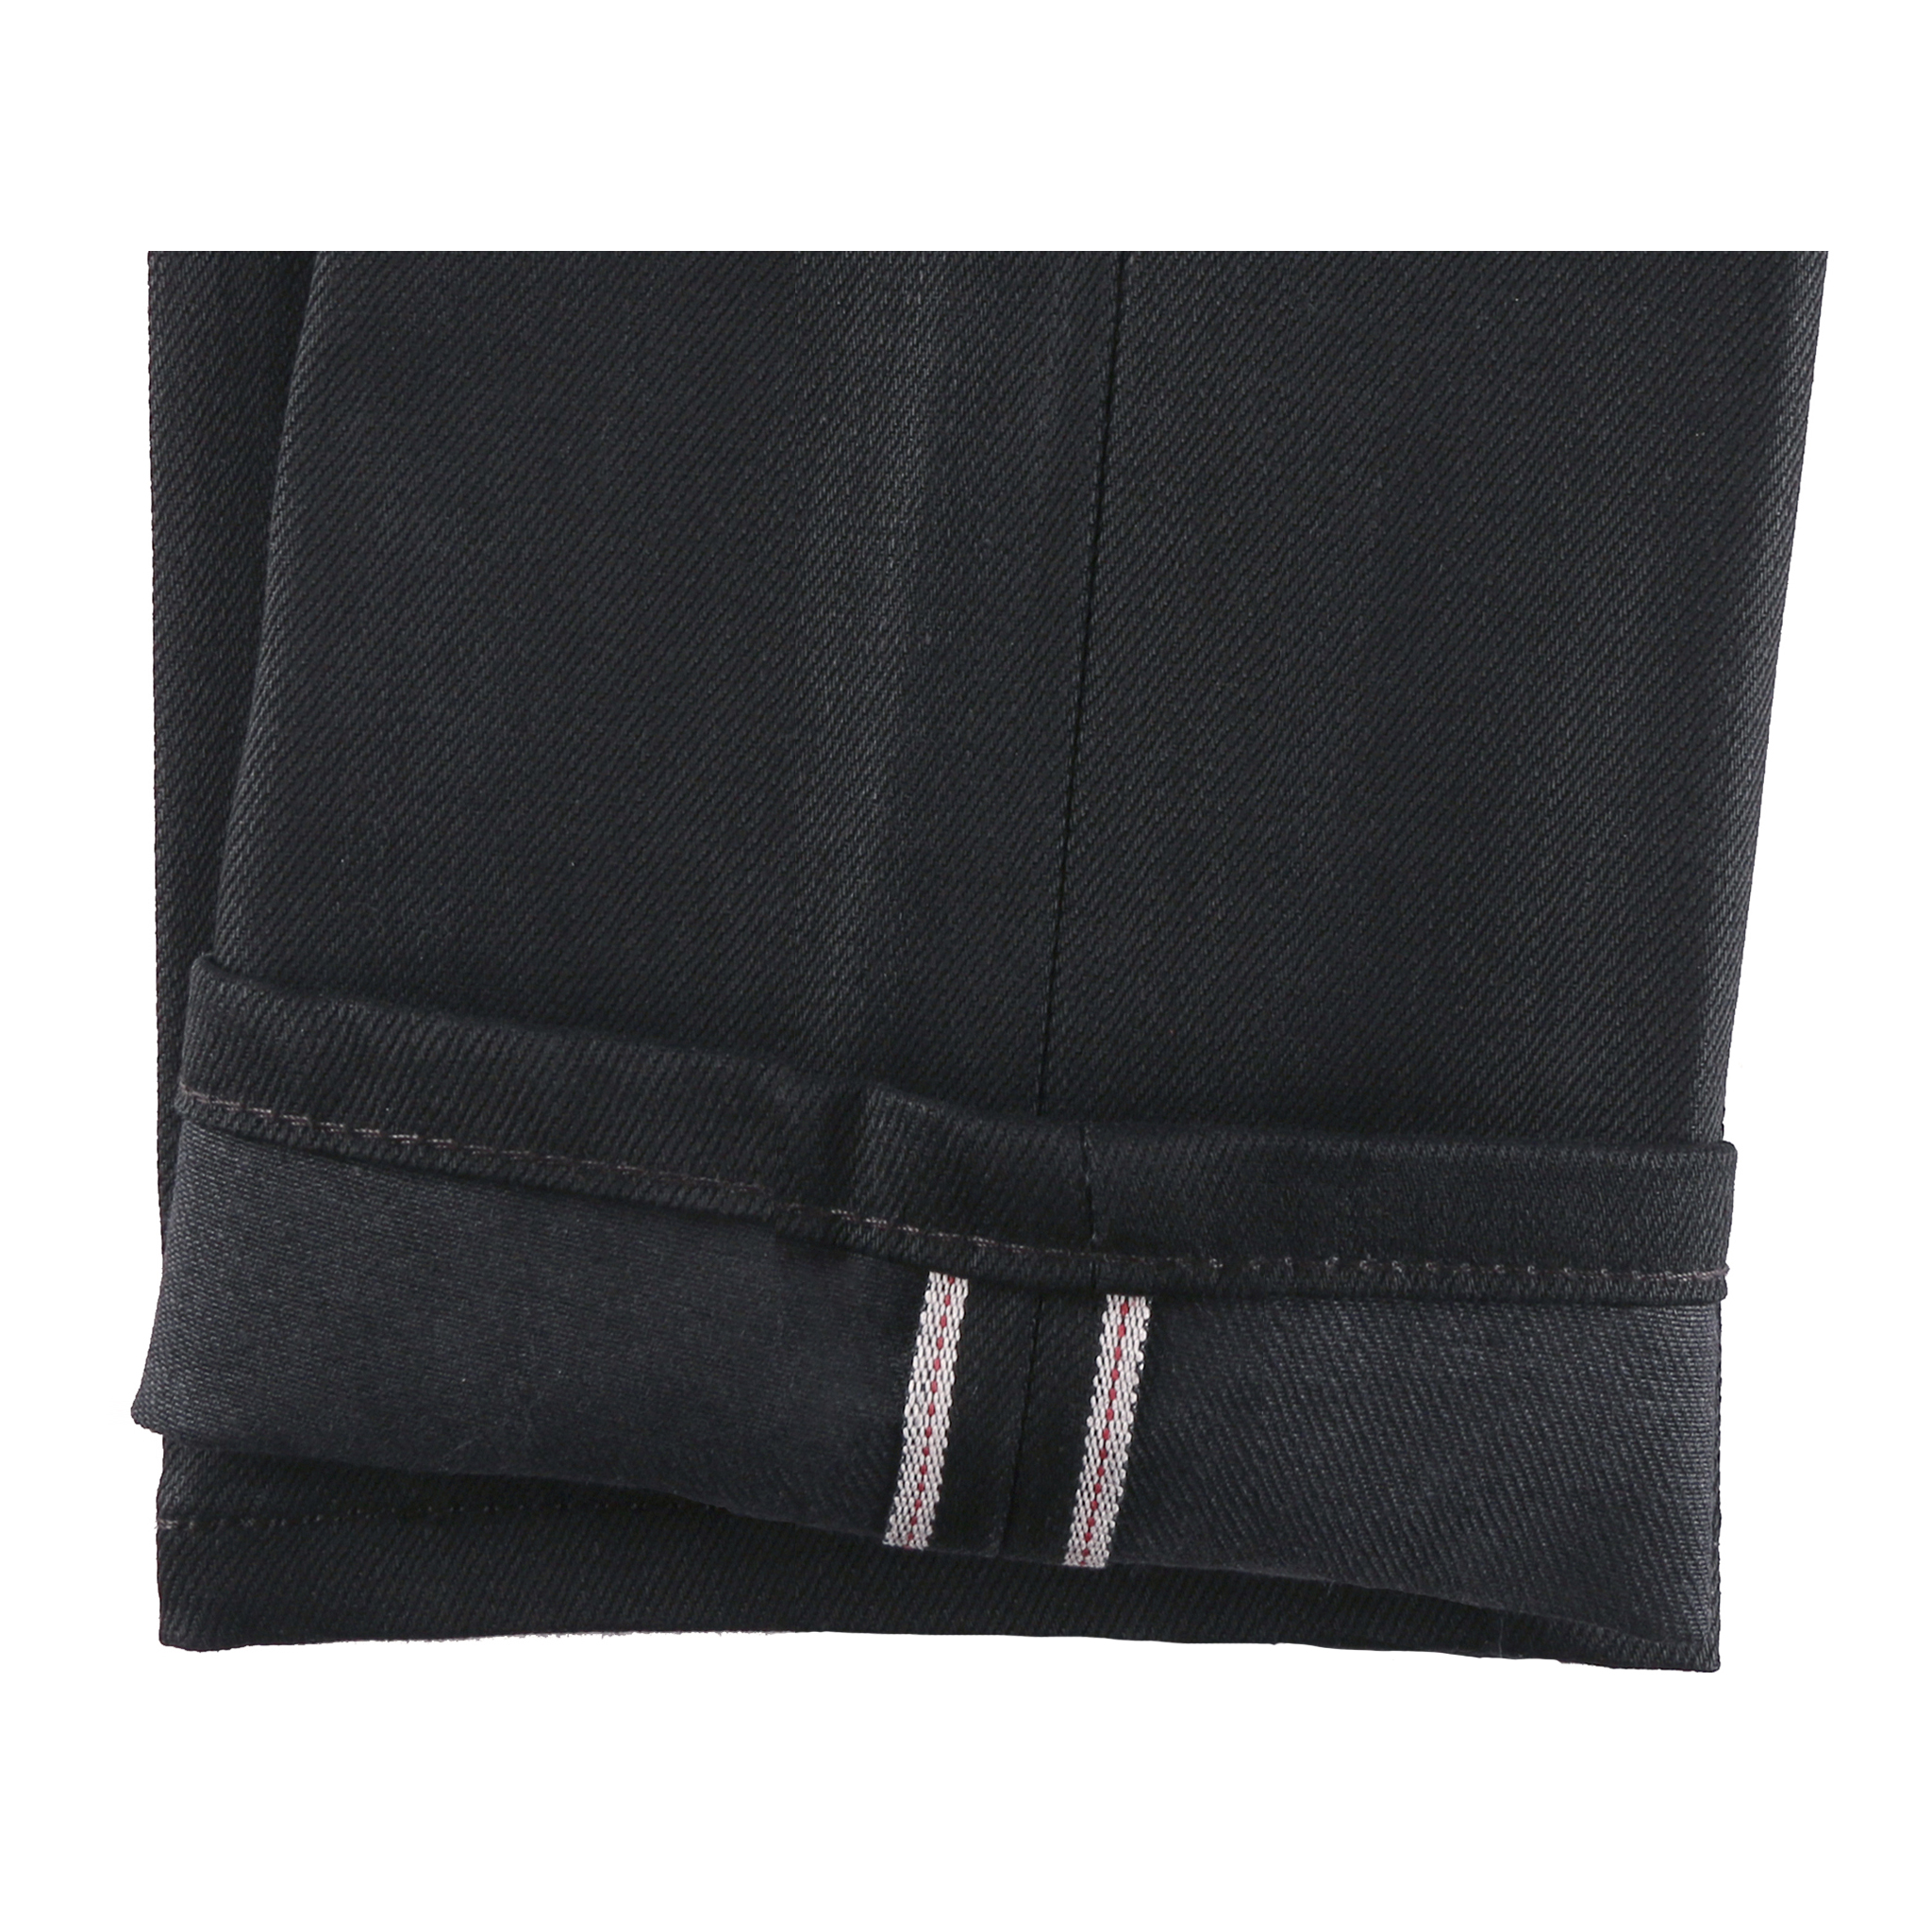 Women's Black Cobra jeans hem